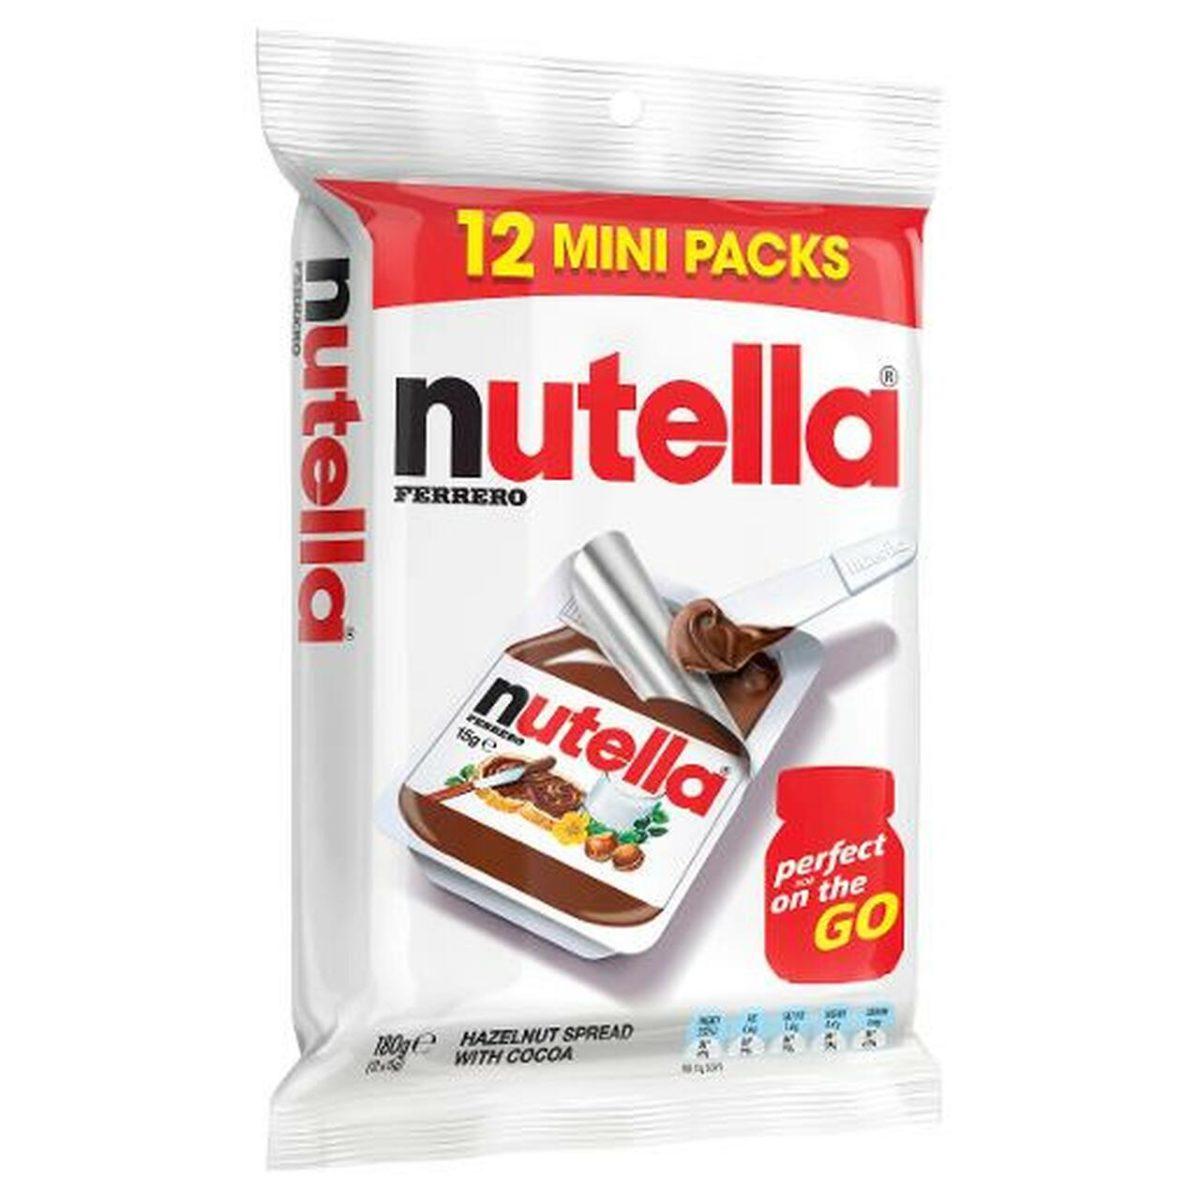 nutella mini packs spread